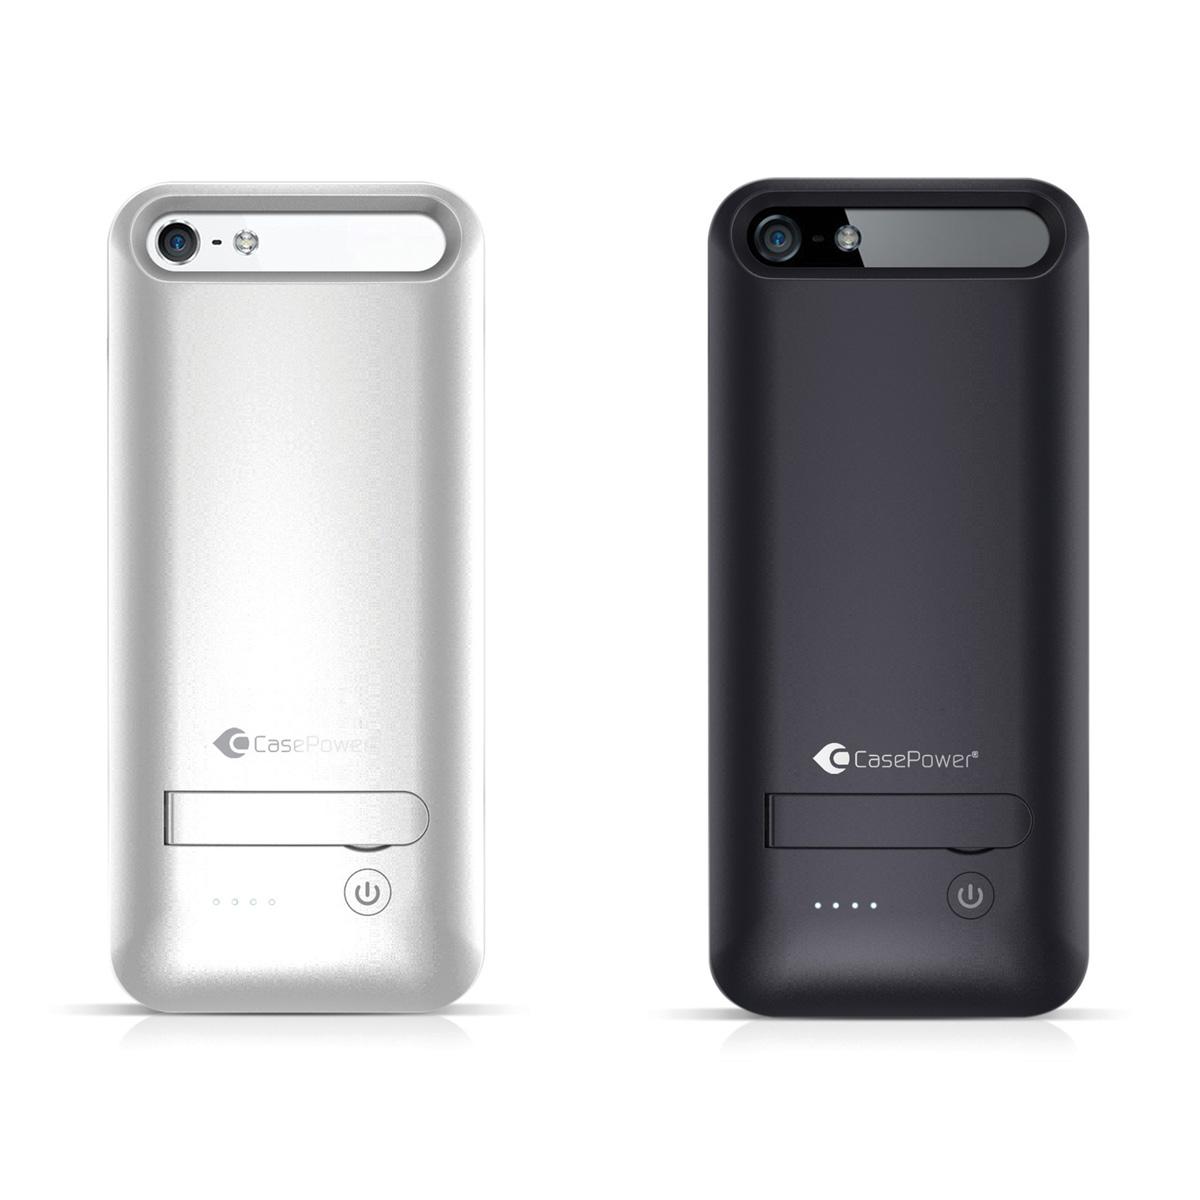 Case Power, custodia iPhone con batteria da 2400 mAh